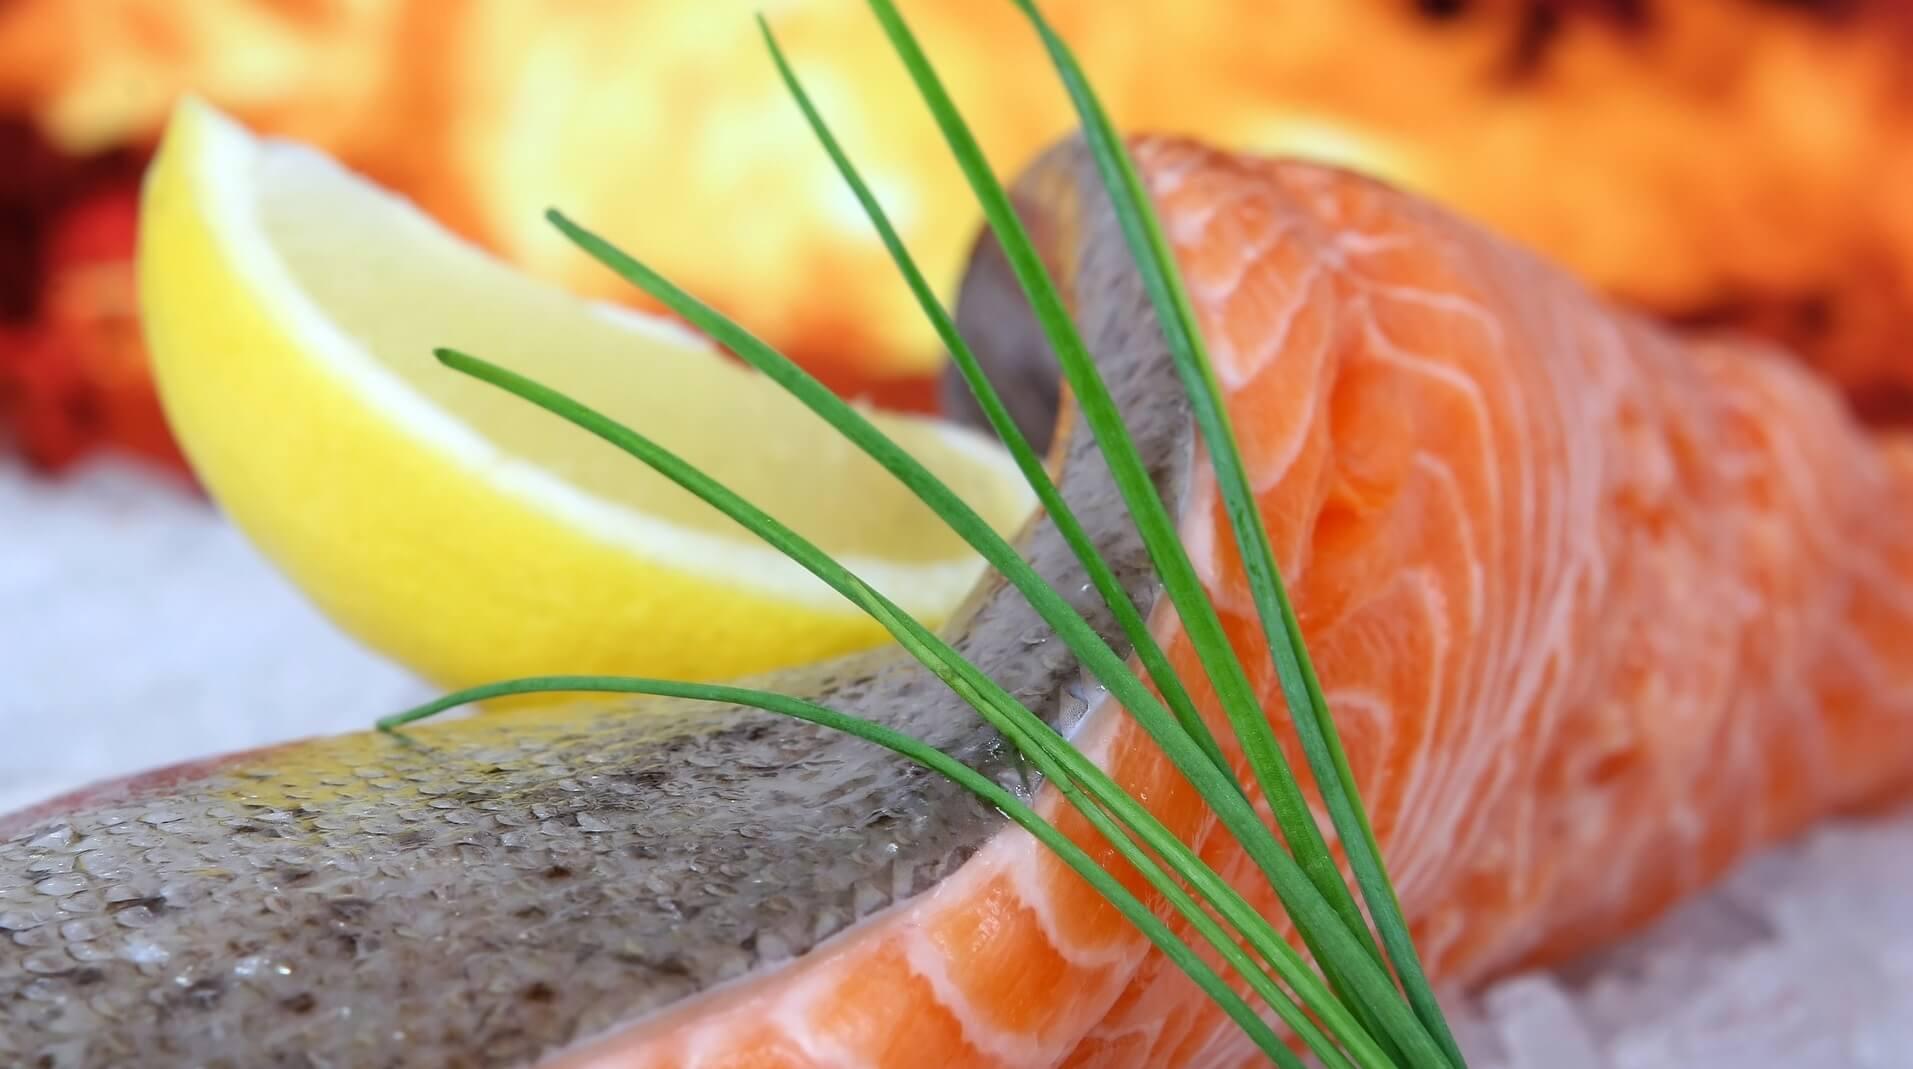 Raw salmon with lemon slice